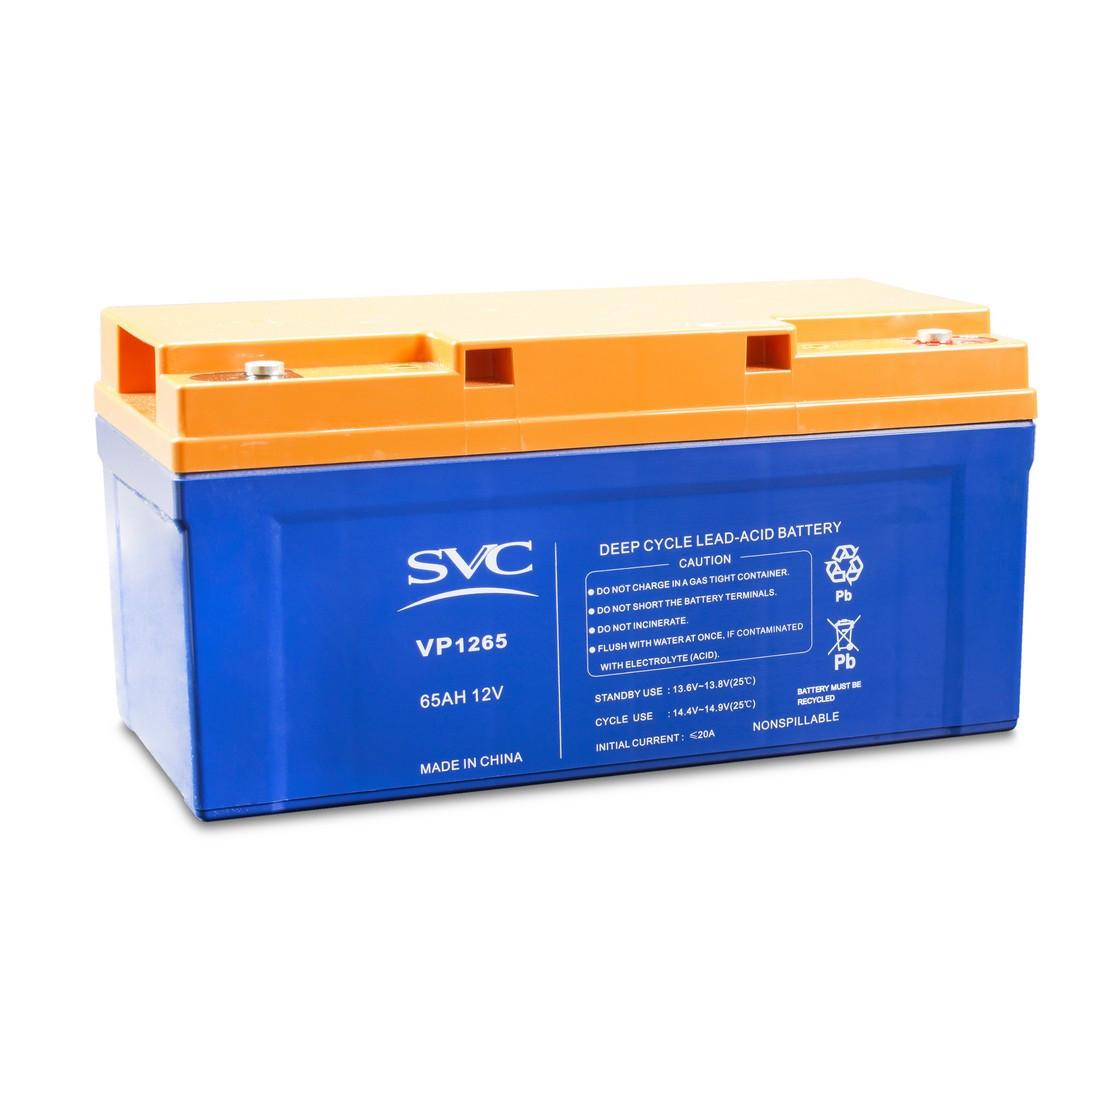 Батарея необслуживаемая (аккумулятор) SVC VP 1265 (12V 65 Ah), Емкость аккумулятора: 65 Ah, Разъемы: F5/F12